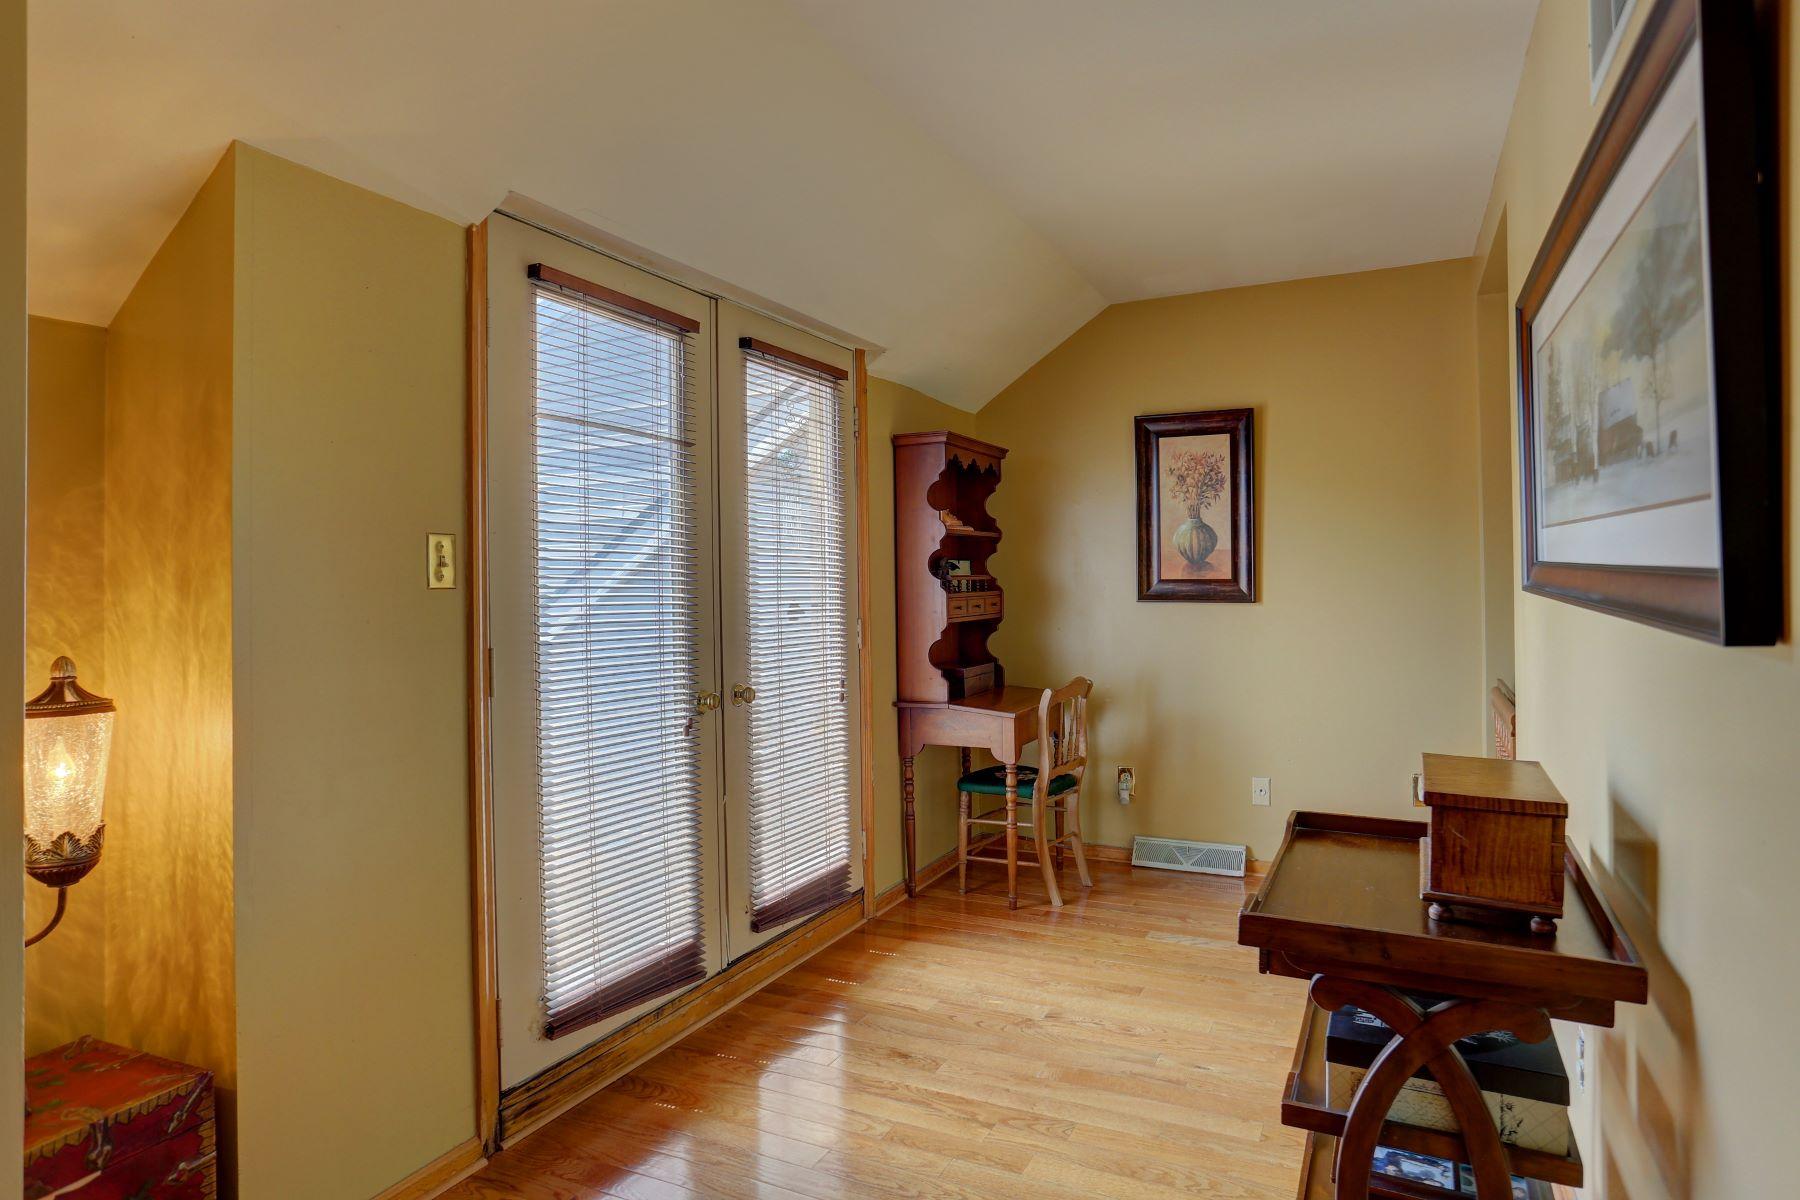 Additional photo for property listing at 300 Koser Road  Lititz, Pennsylvania 17543 Estados Unidos